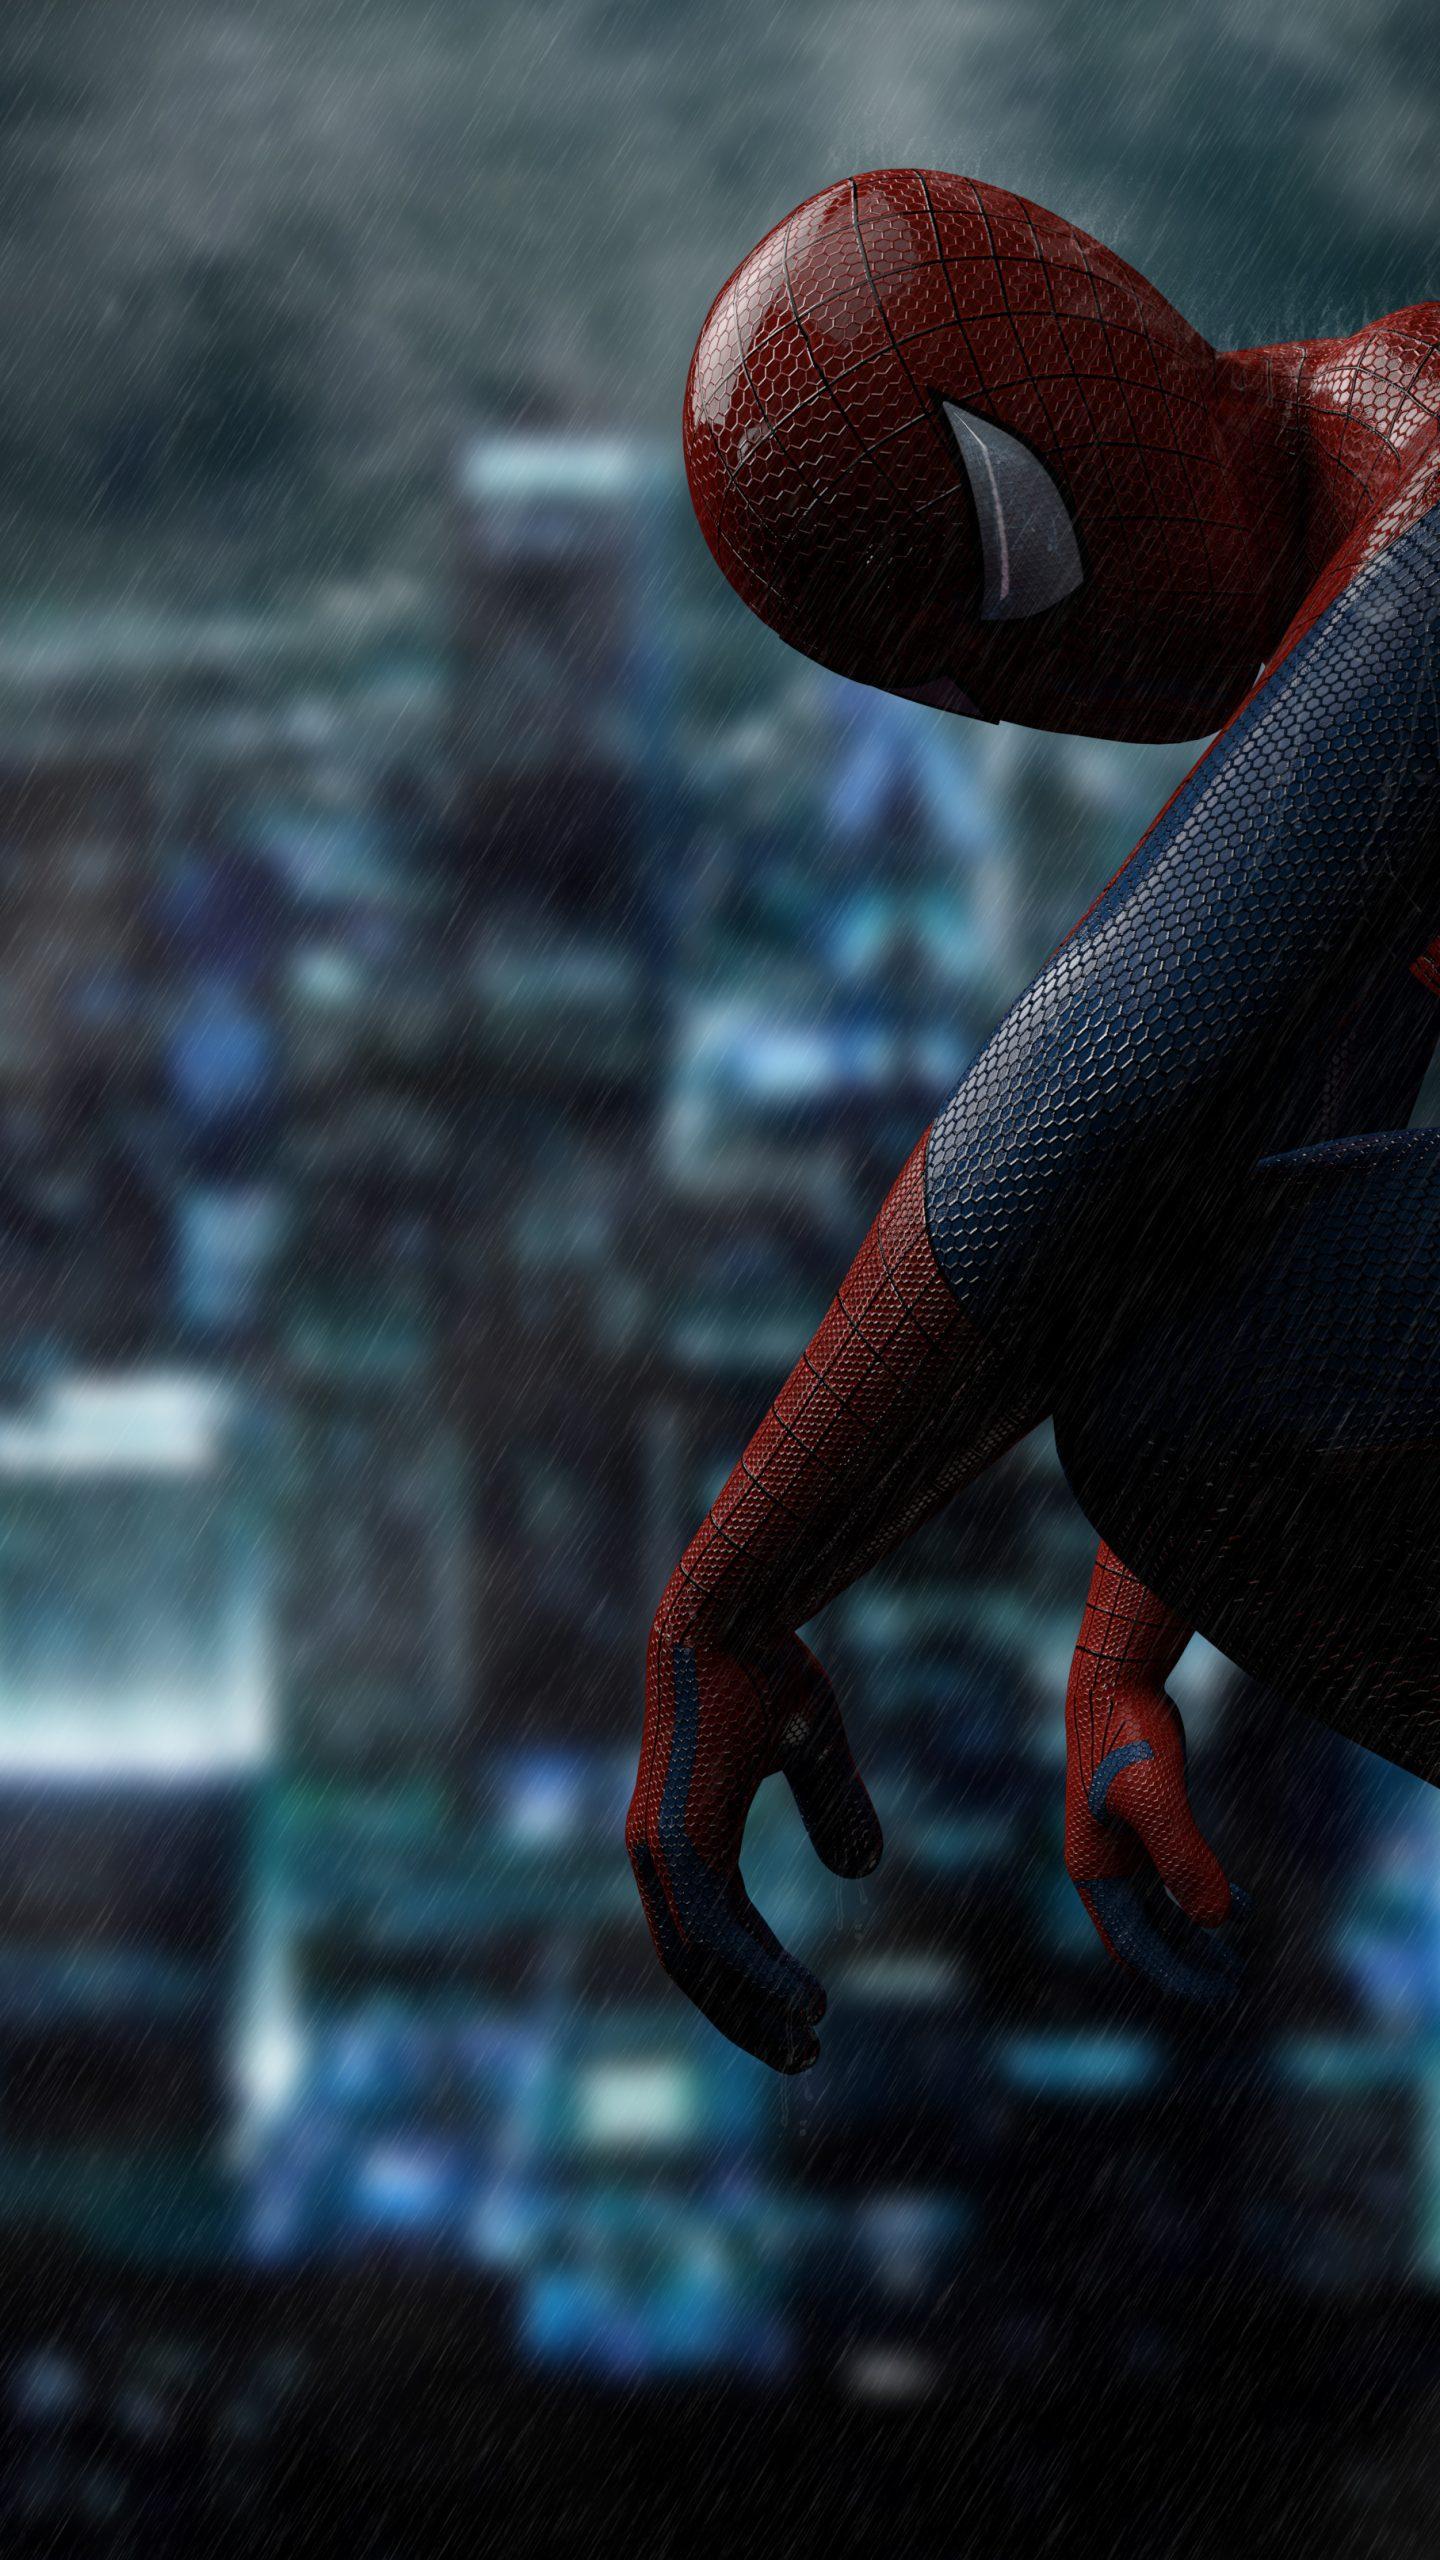 Spider-Man 4k Mobile Wallpapers - Wallpaper Cave